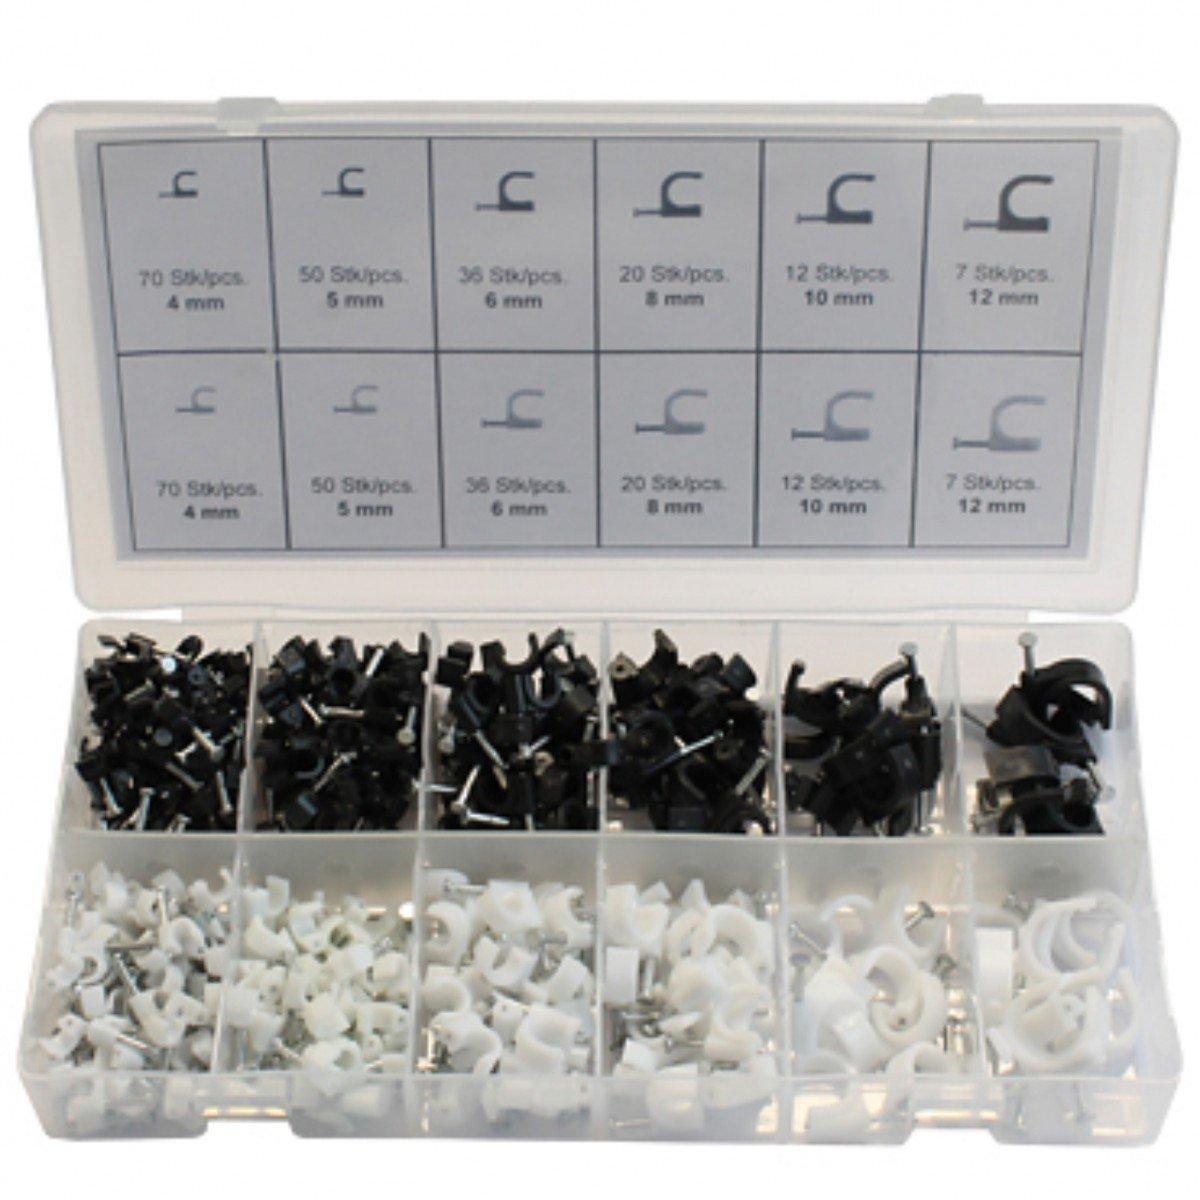 Nagelschellen 4-12mm Kunststoff 390tlg Sichtbox Kabelschelle Kabelklemmen